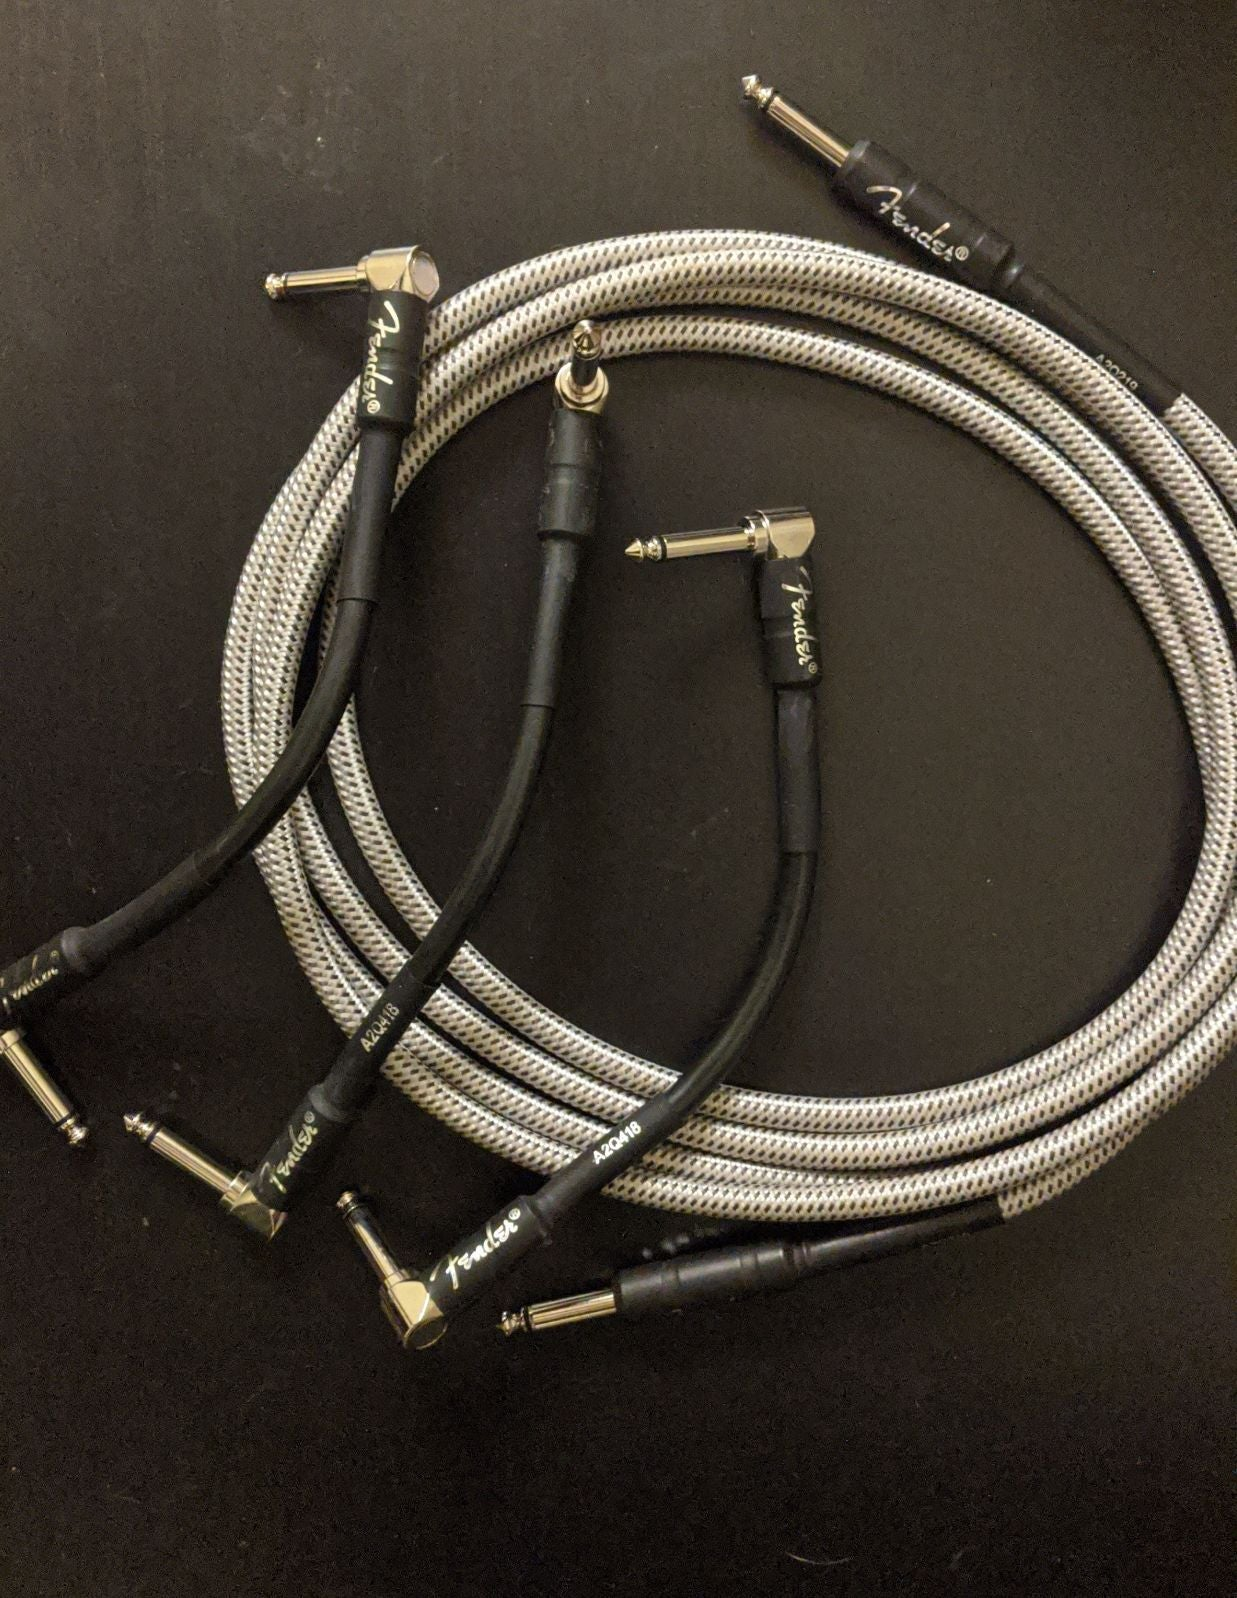 Fender Instrument & Patch Cables